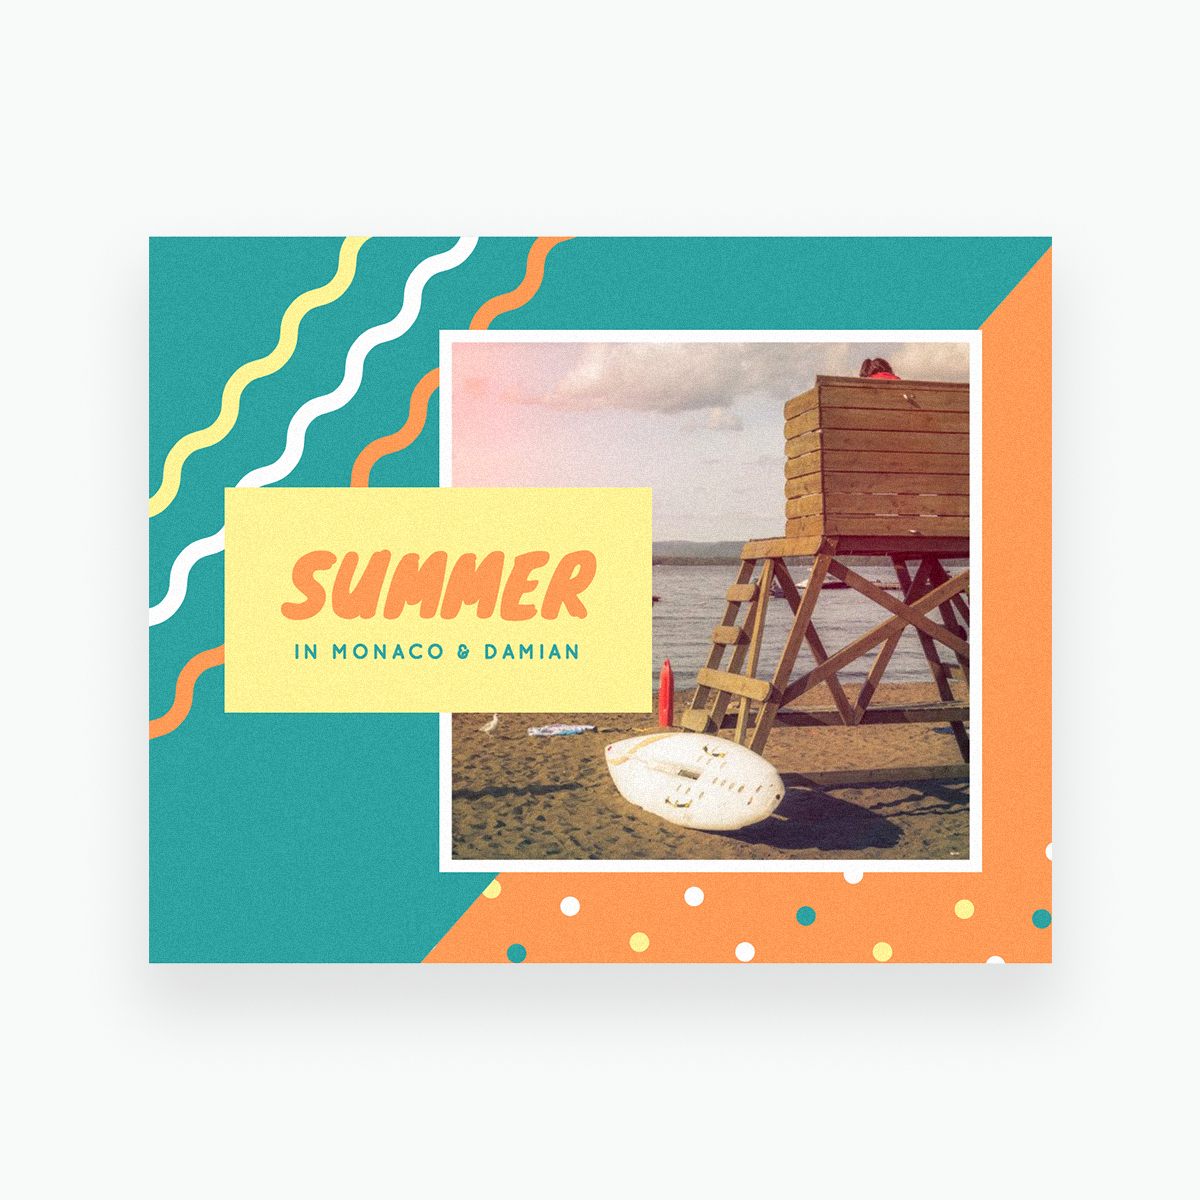 Free Online Scrapbook Maker: Create Custom Designs Online   Canva - Free Printable Scrapbook Pages Online